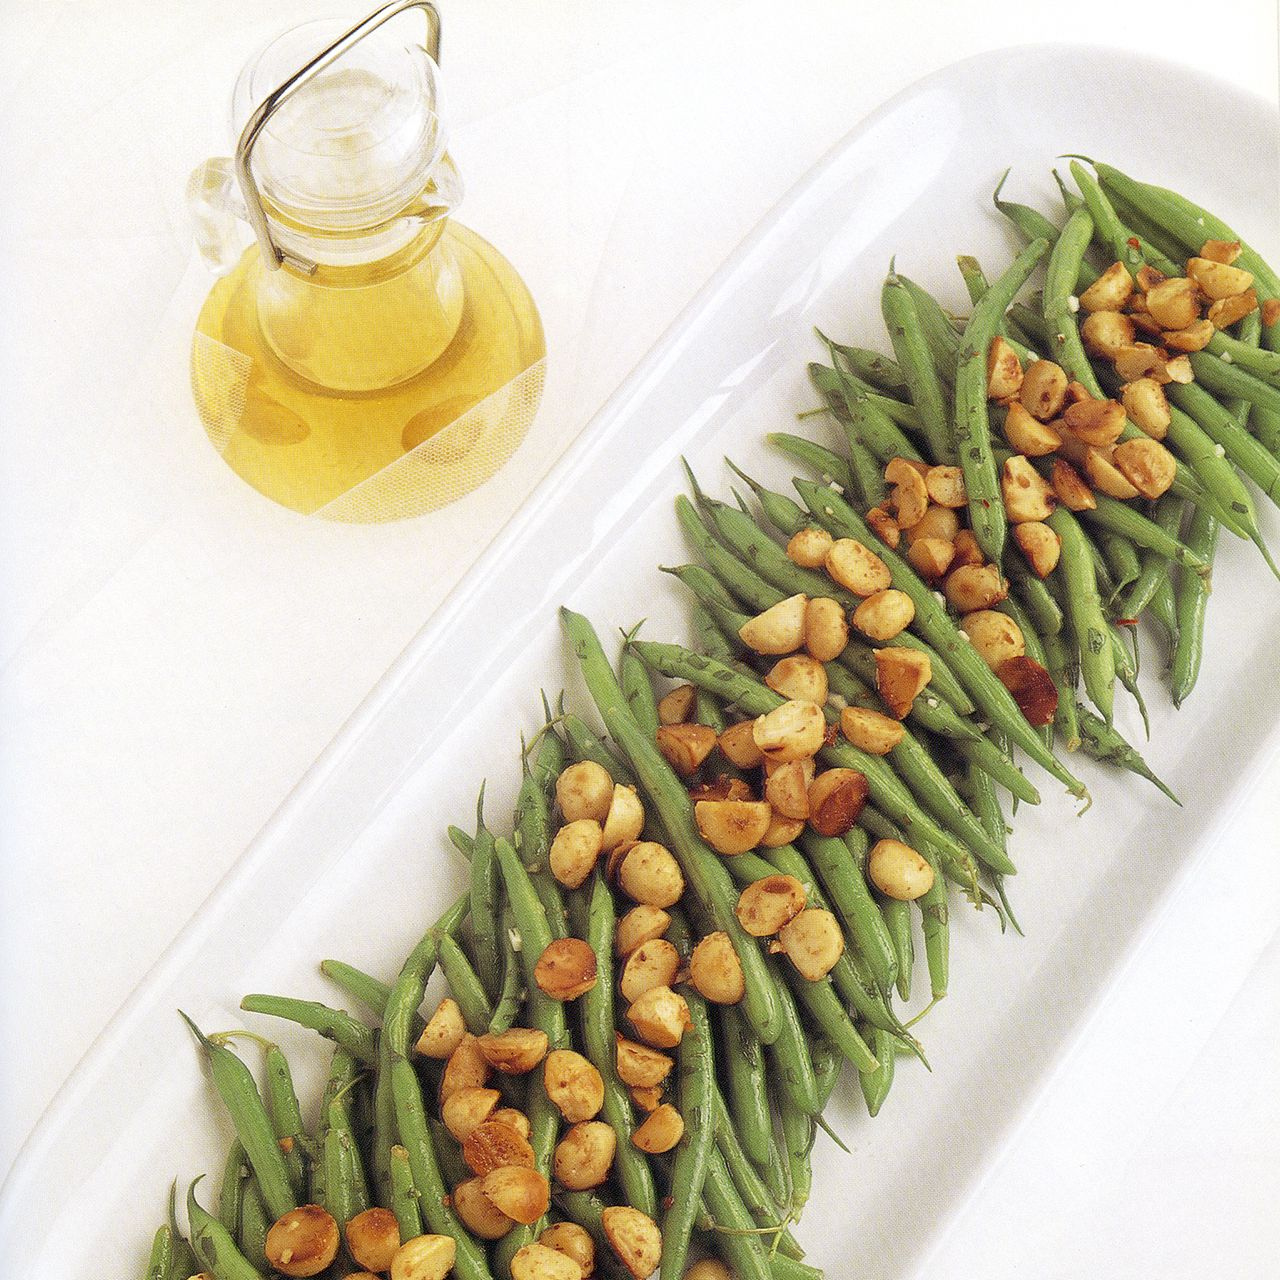 Green Bean Salad with Roasted Macadamia Nuts and Macadamia Nut Oil Vinaigrette